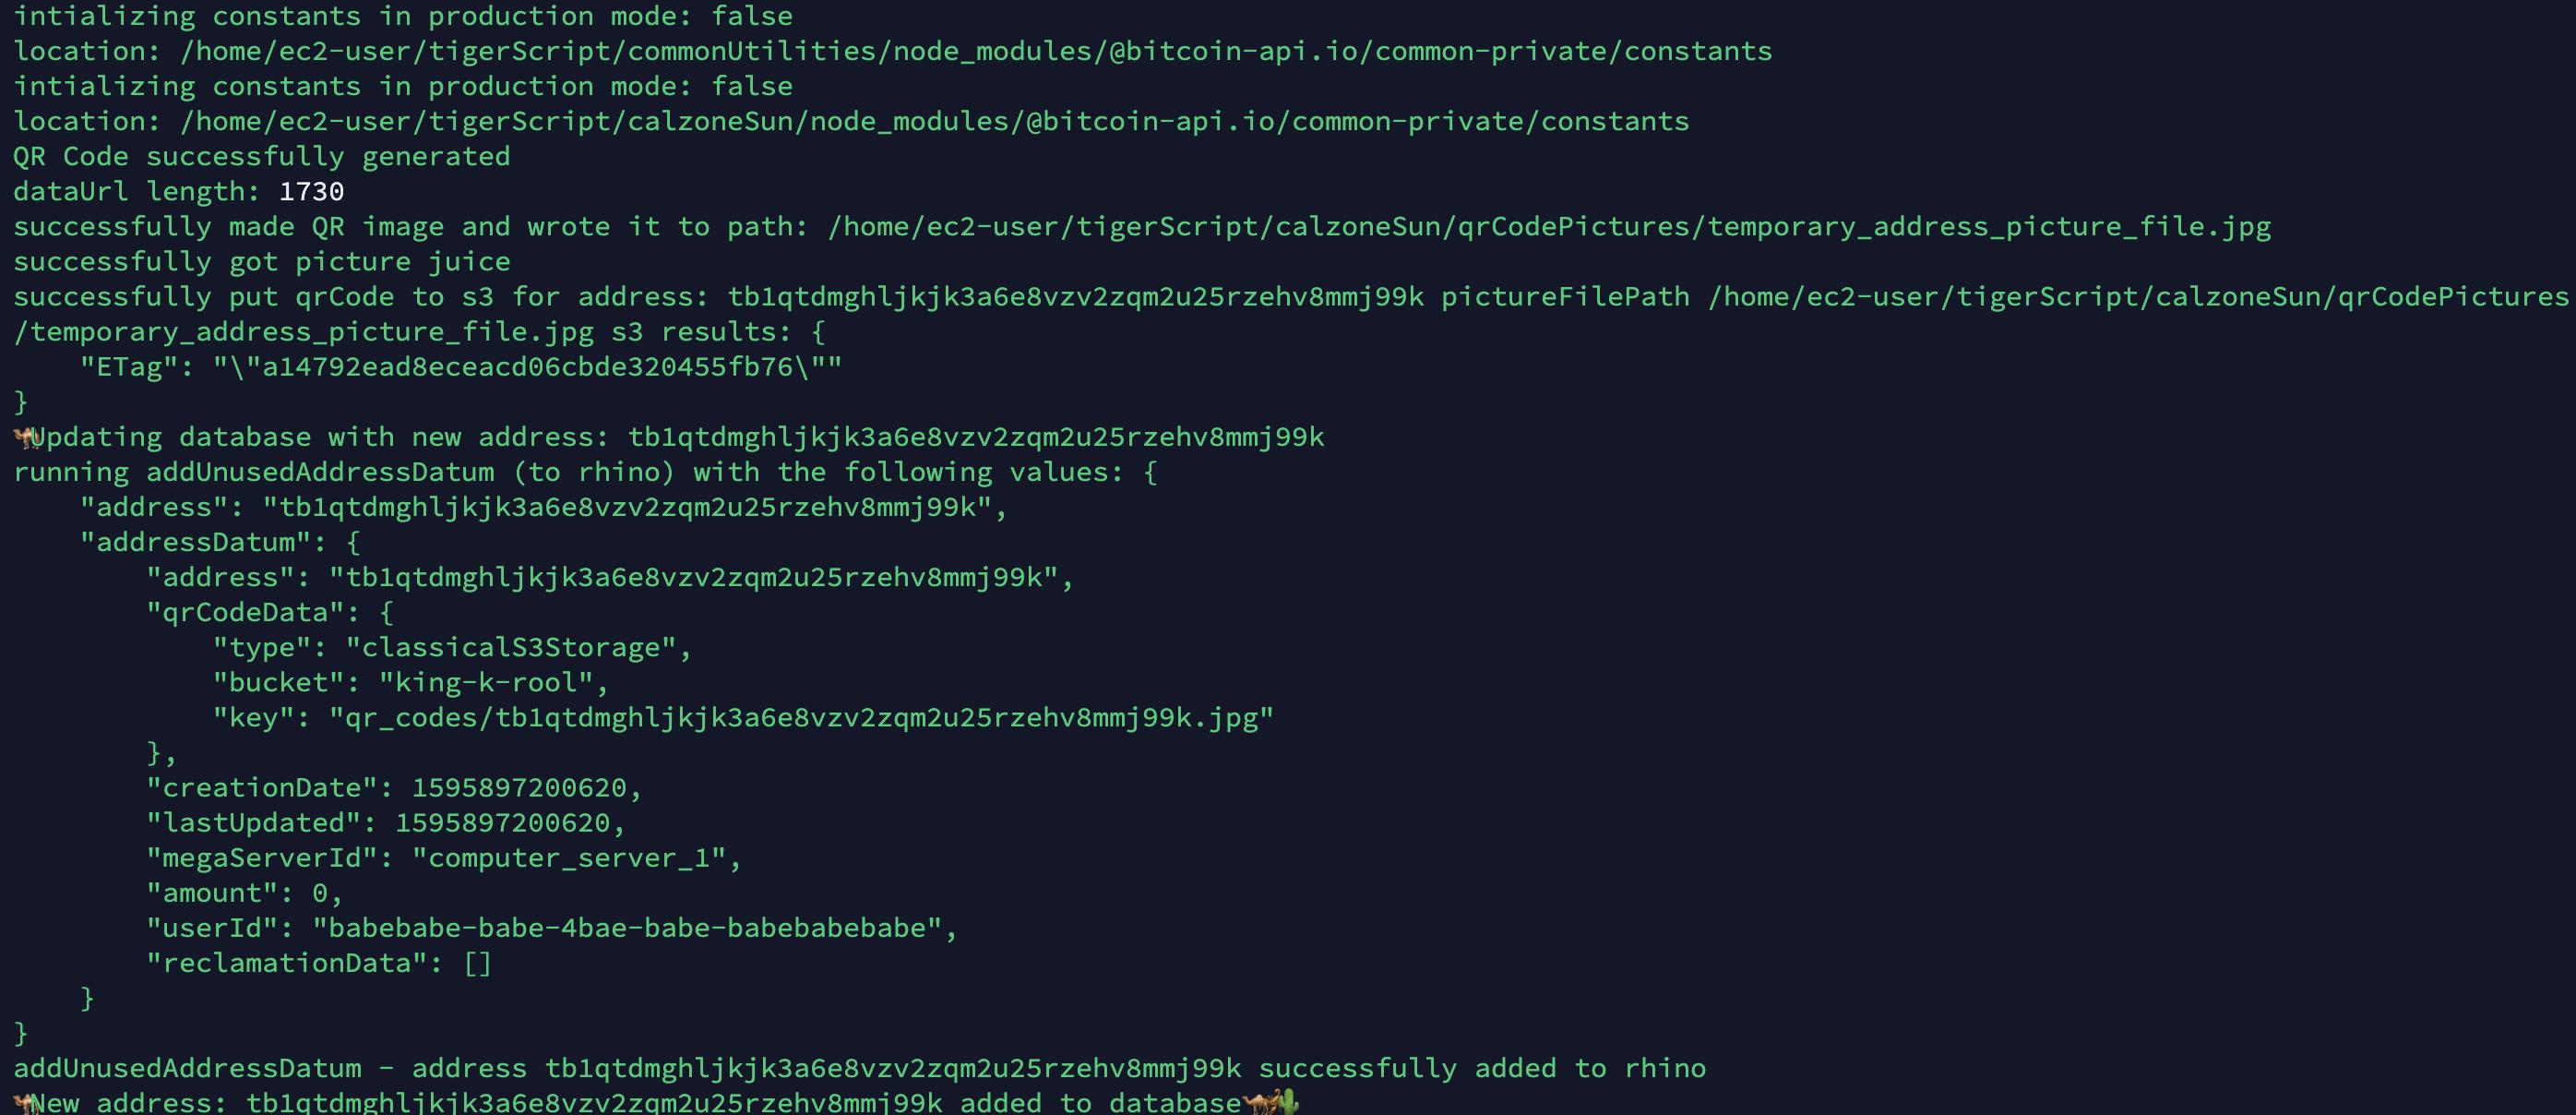 GitHub - bitcoin-api/bitcoin-api-full-stack: Full-Stack ...